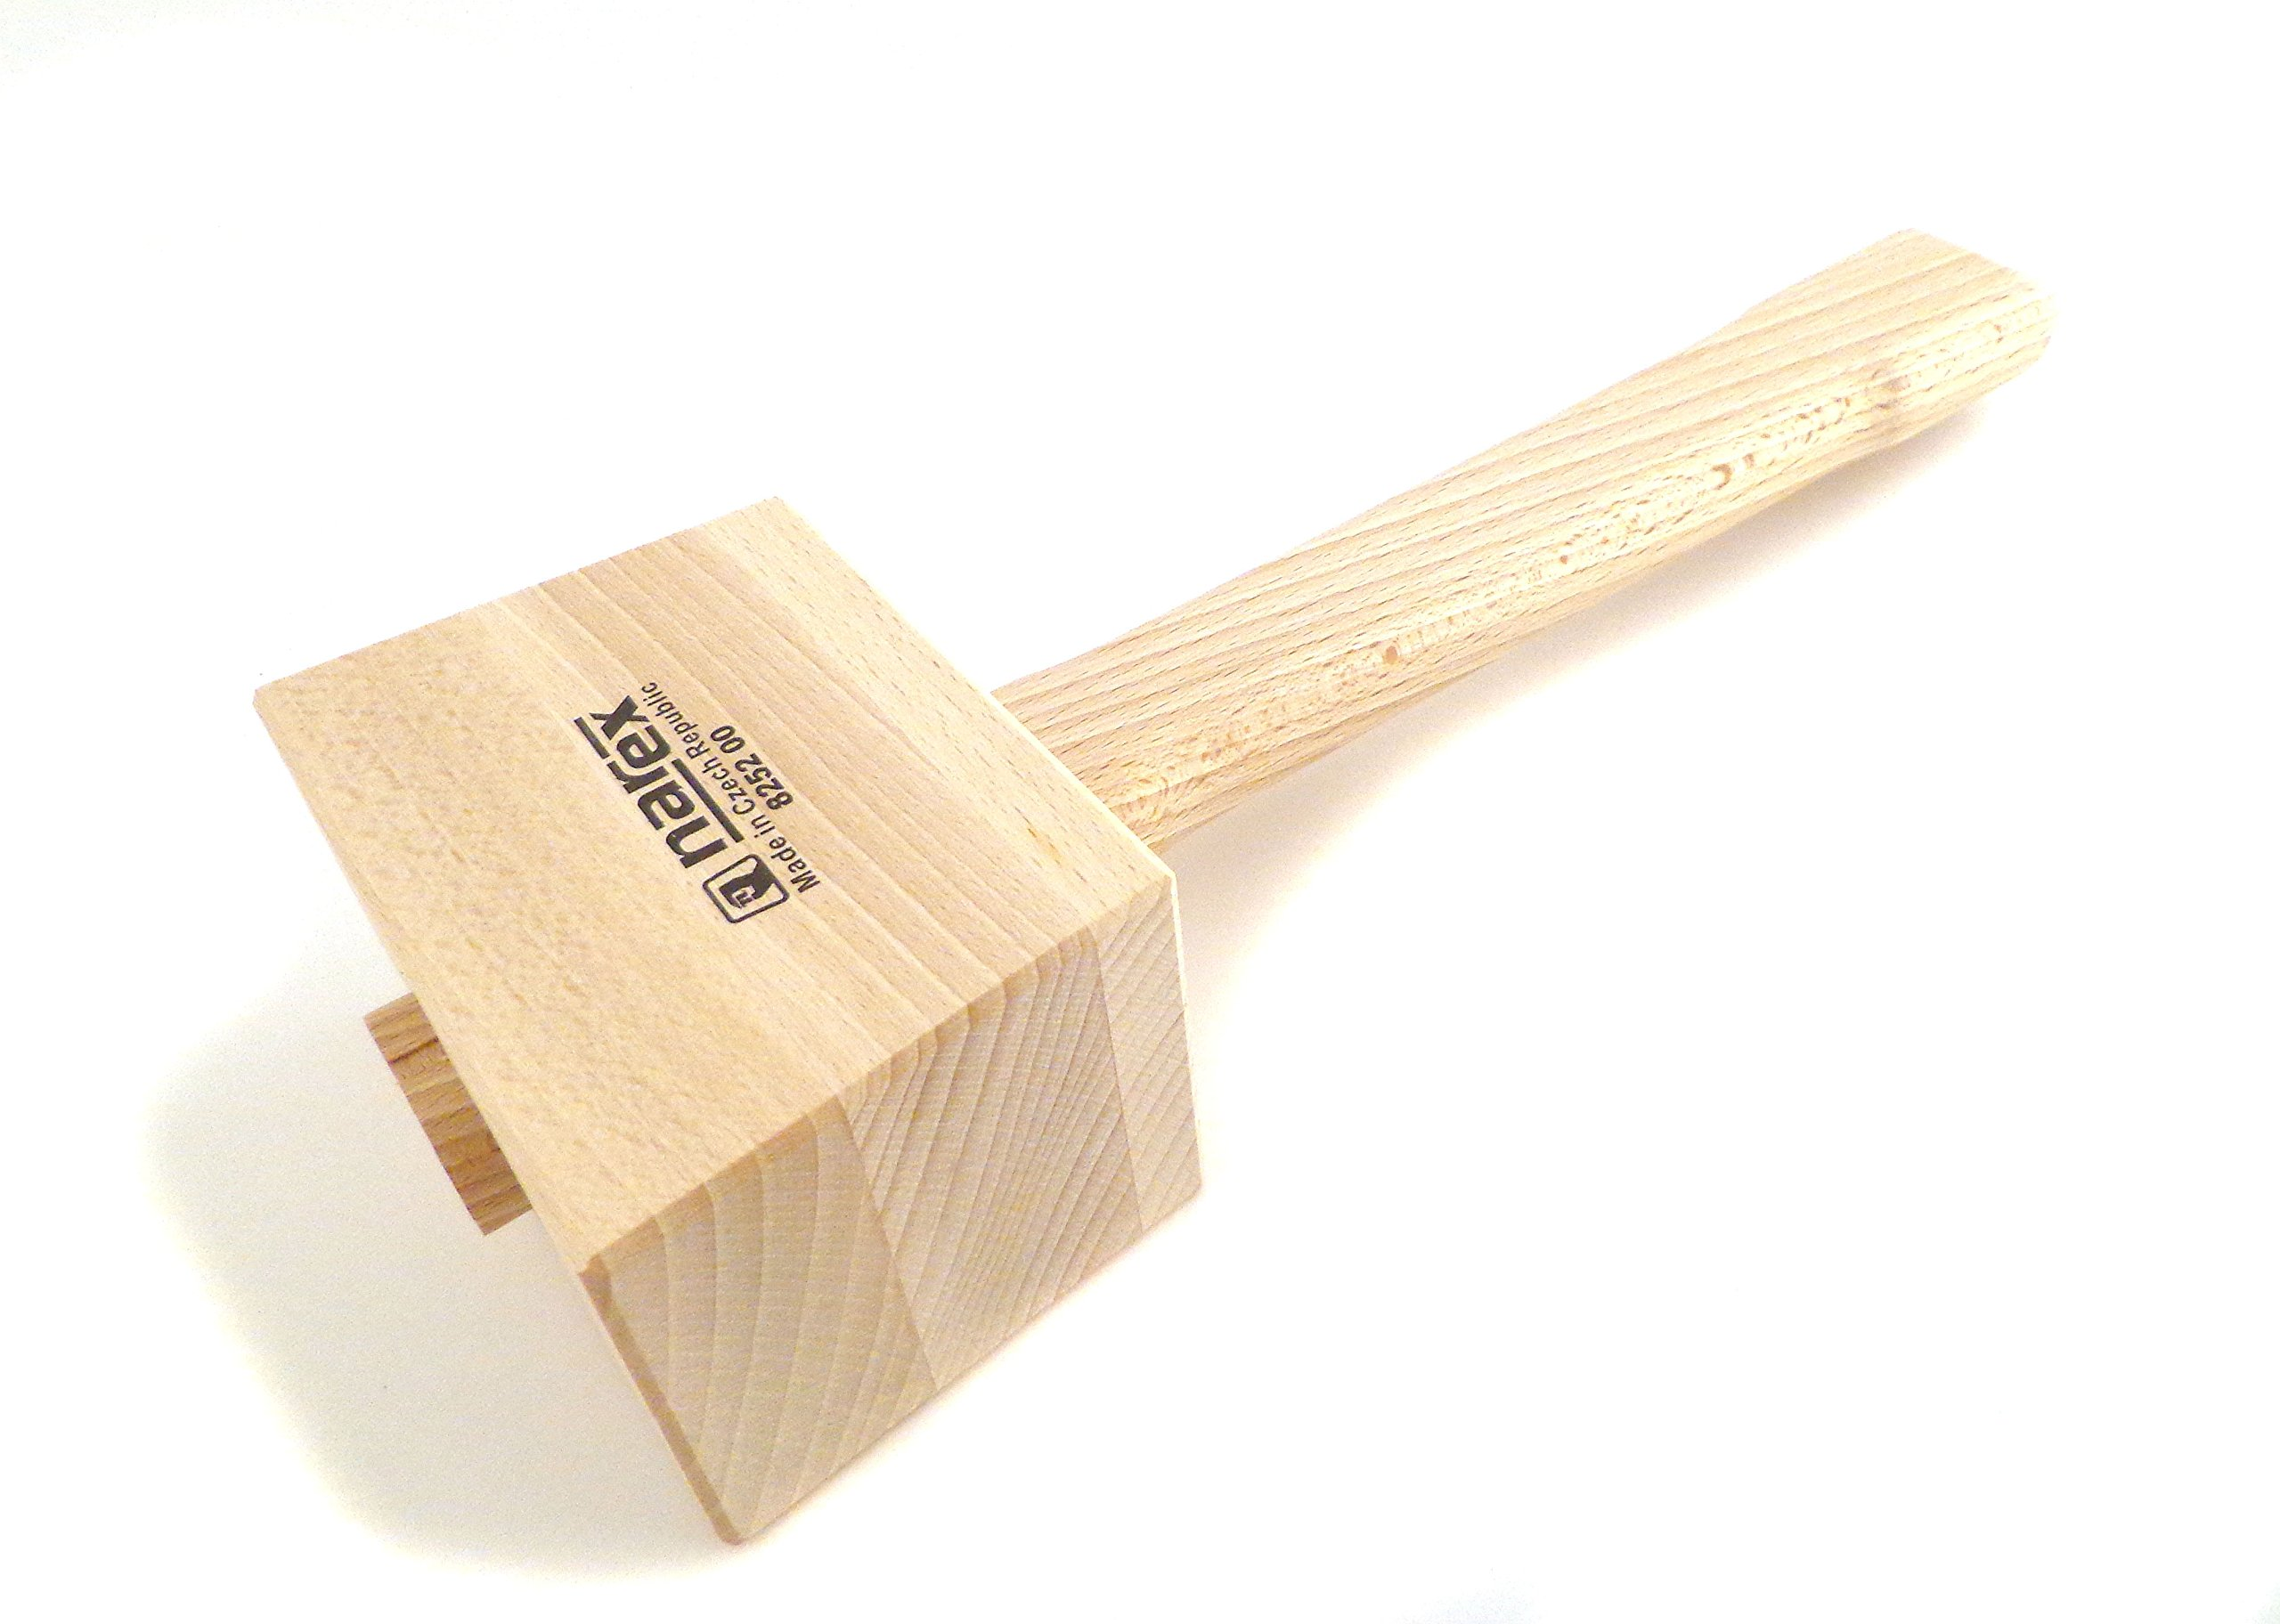 Narex 460 gram 16 oz Beech Wood Carving Mallet